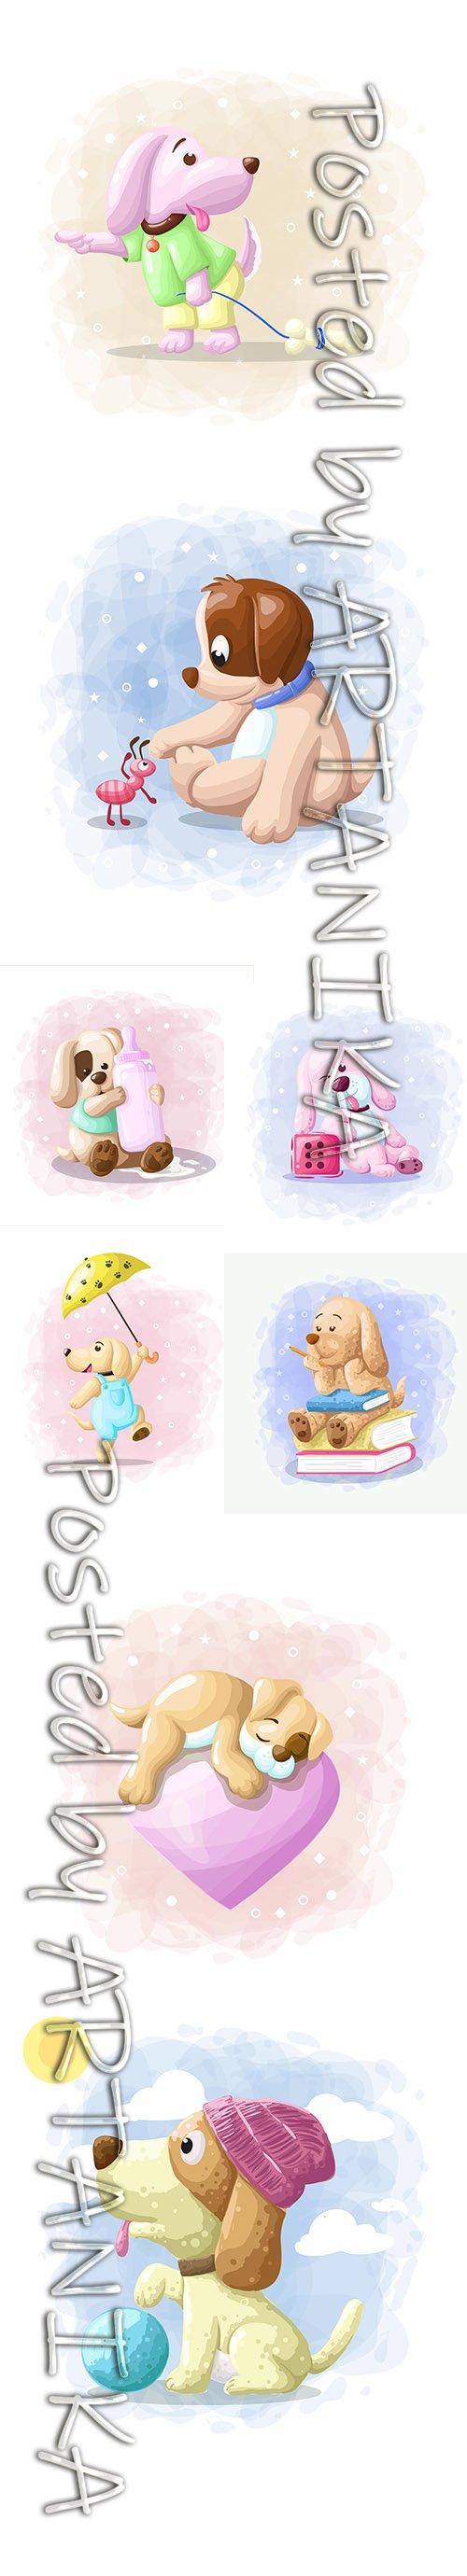 Cute Little Animals Cartoon Illustrations